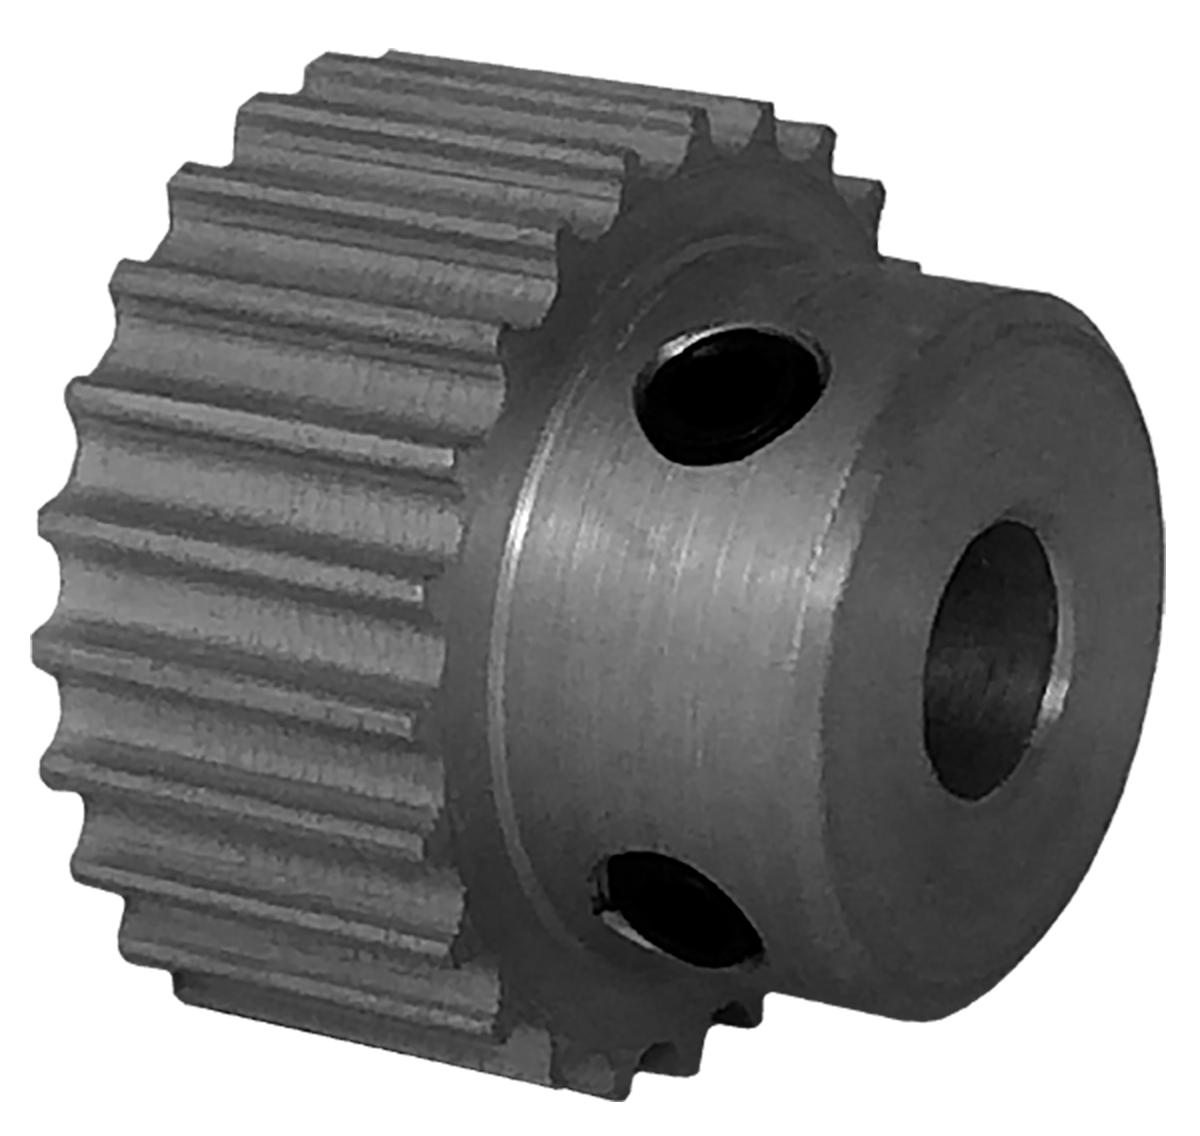 24-3M06M6A6 - Aluminum Powerhouse®HTD® Pulleys